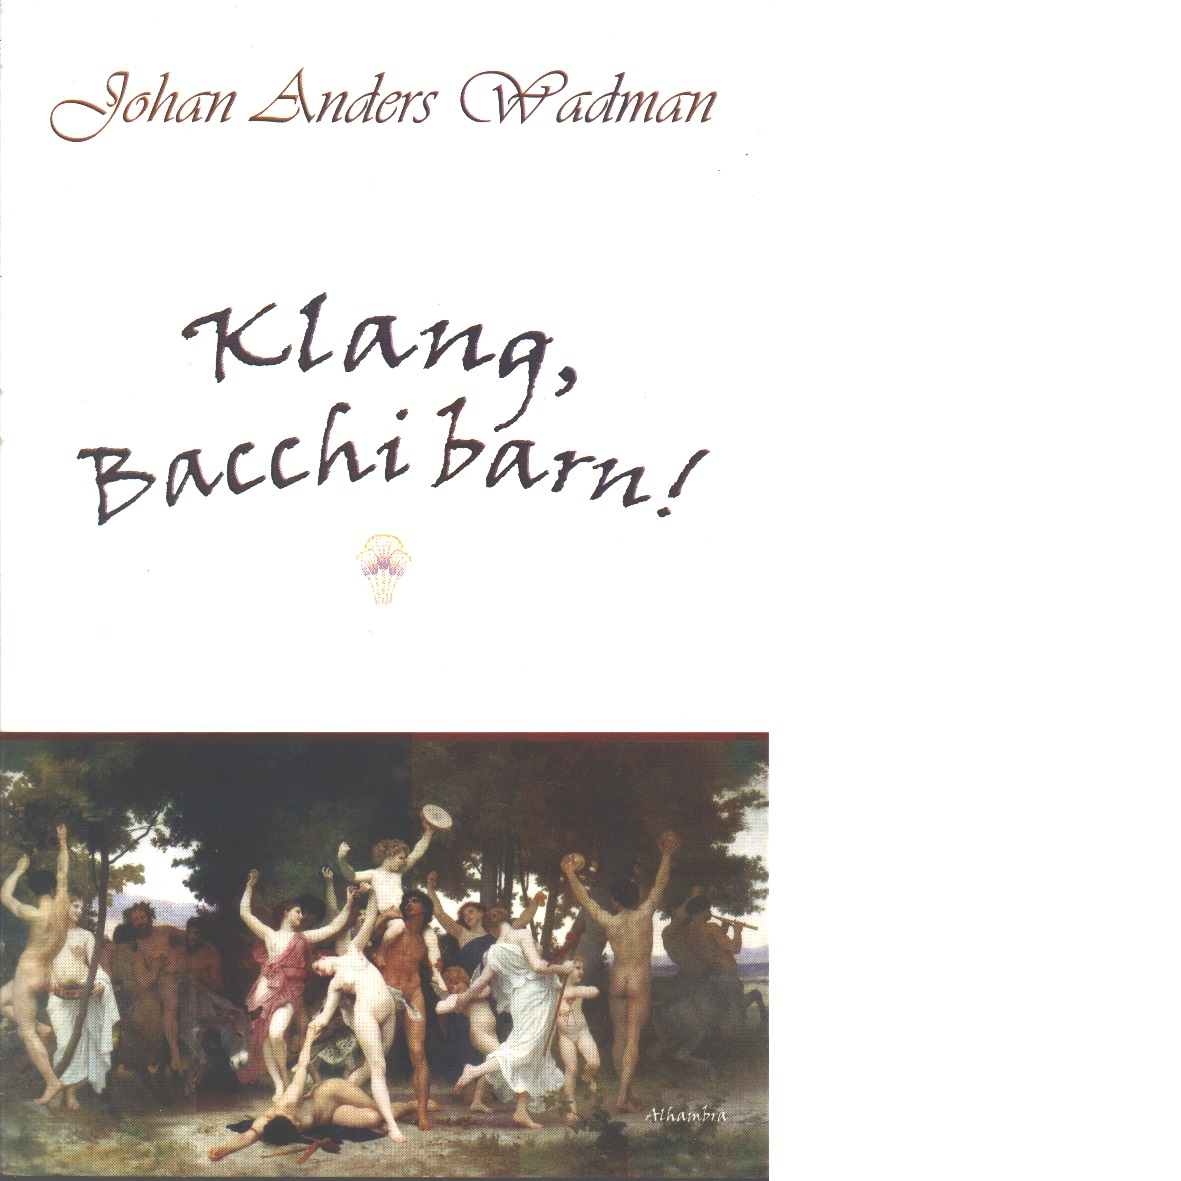 Klang, Bacchi barn! - Wadman, Johan Anders